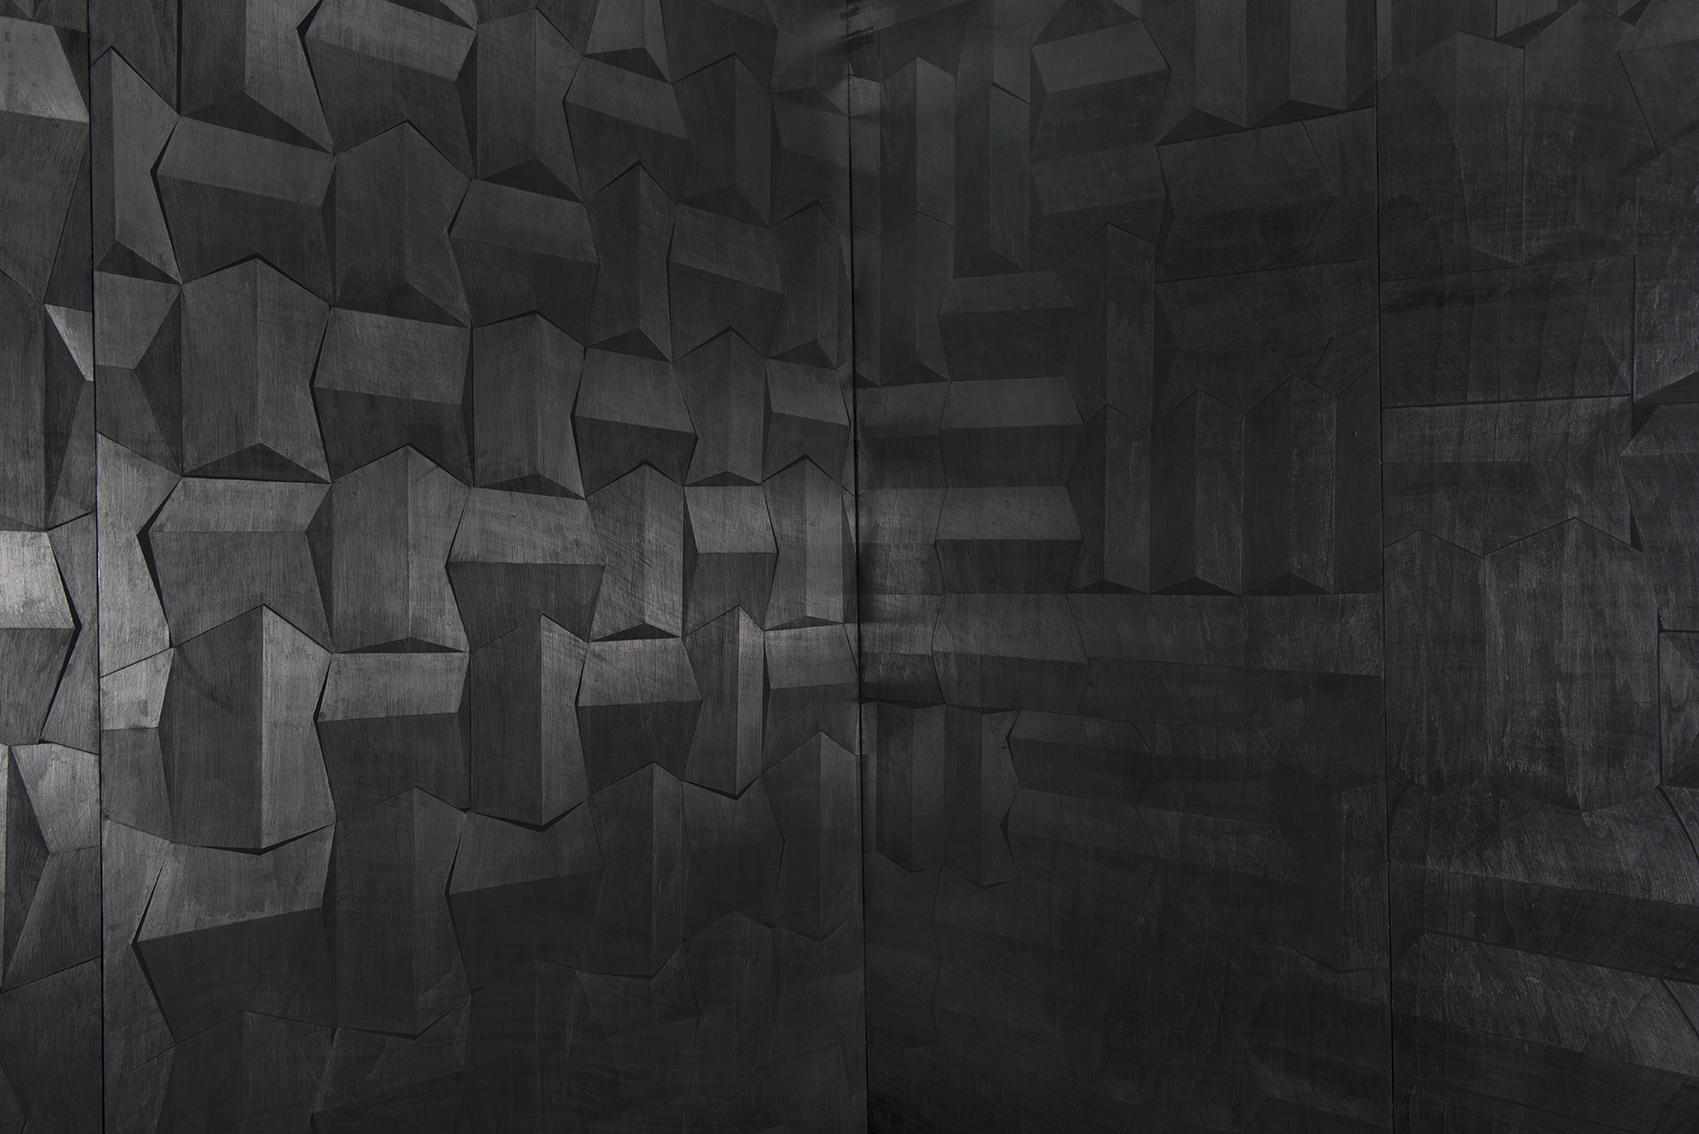 Hado, פחם וגרפיט על עץ, פרט מתוך מיצב, 2014 (5).jpg